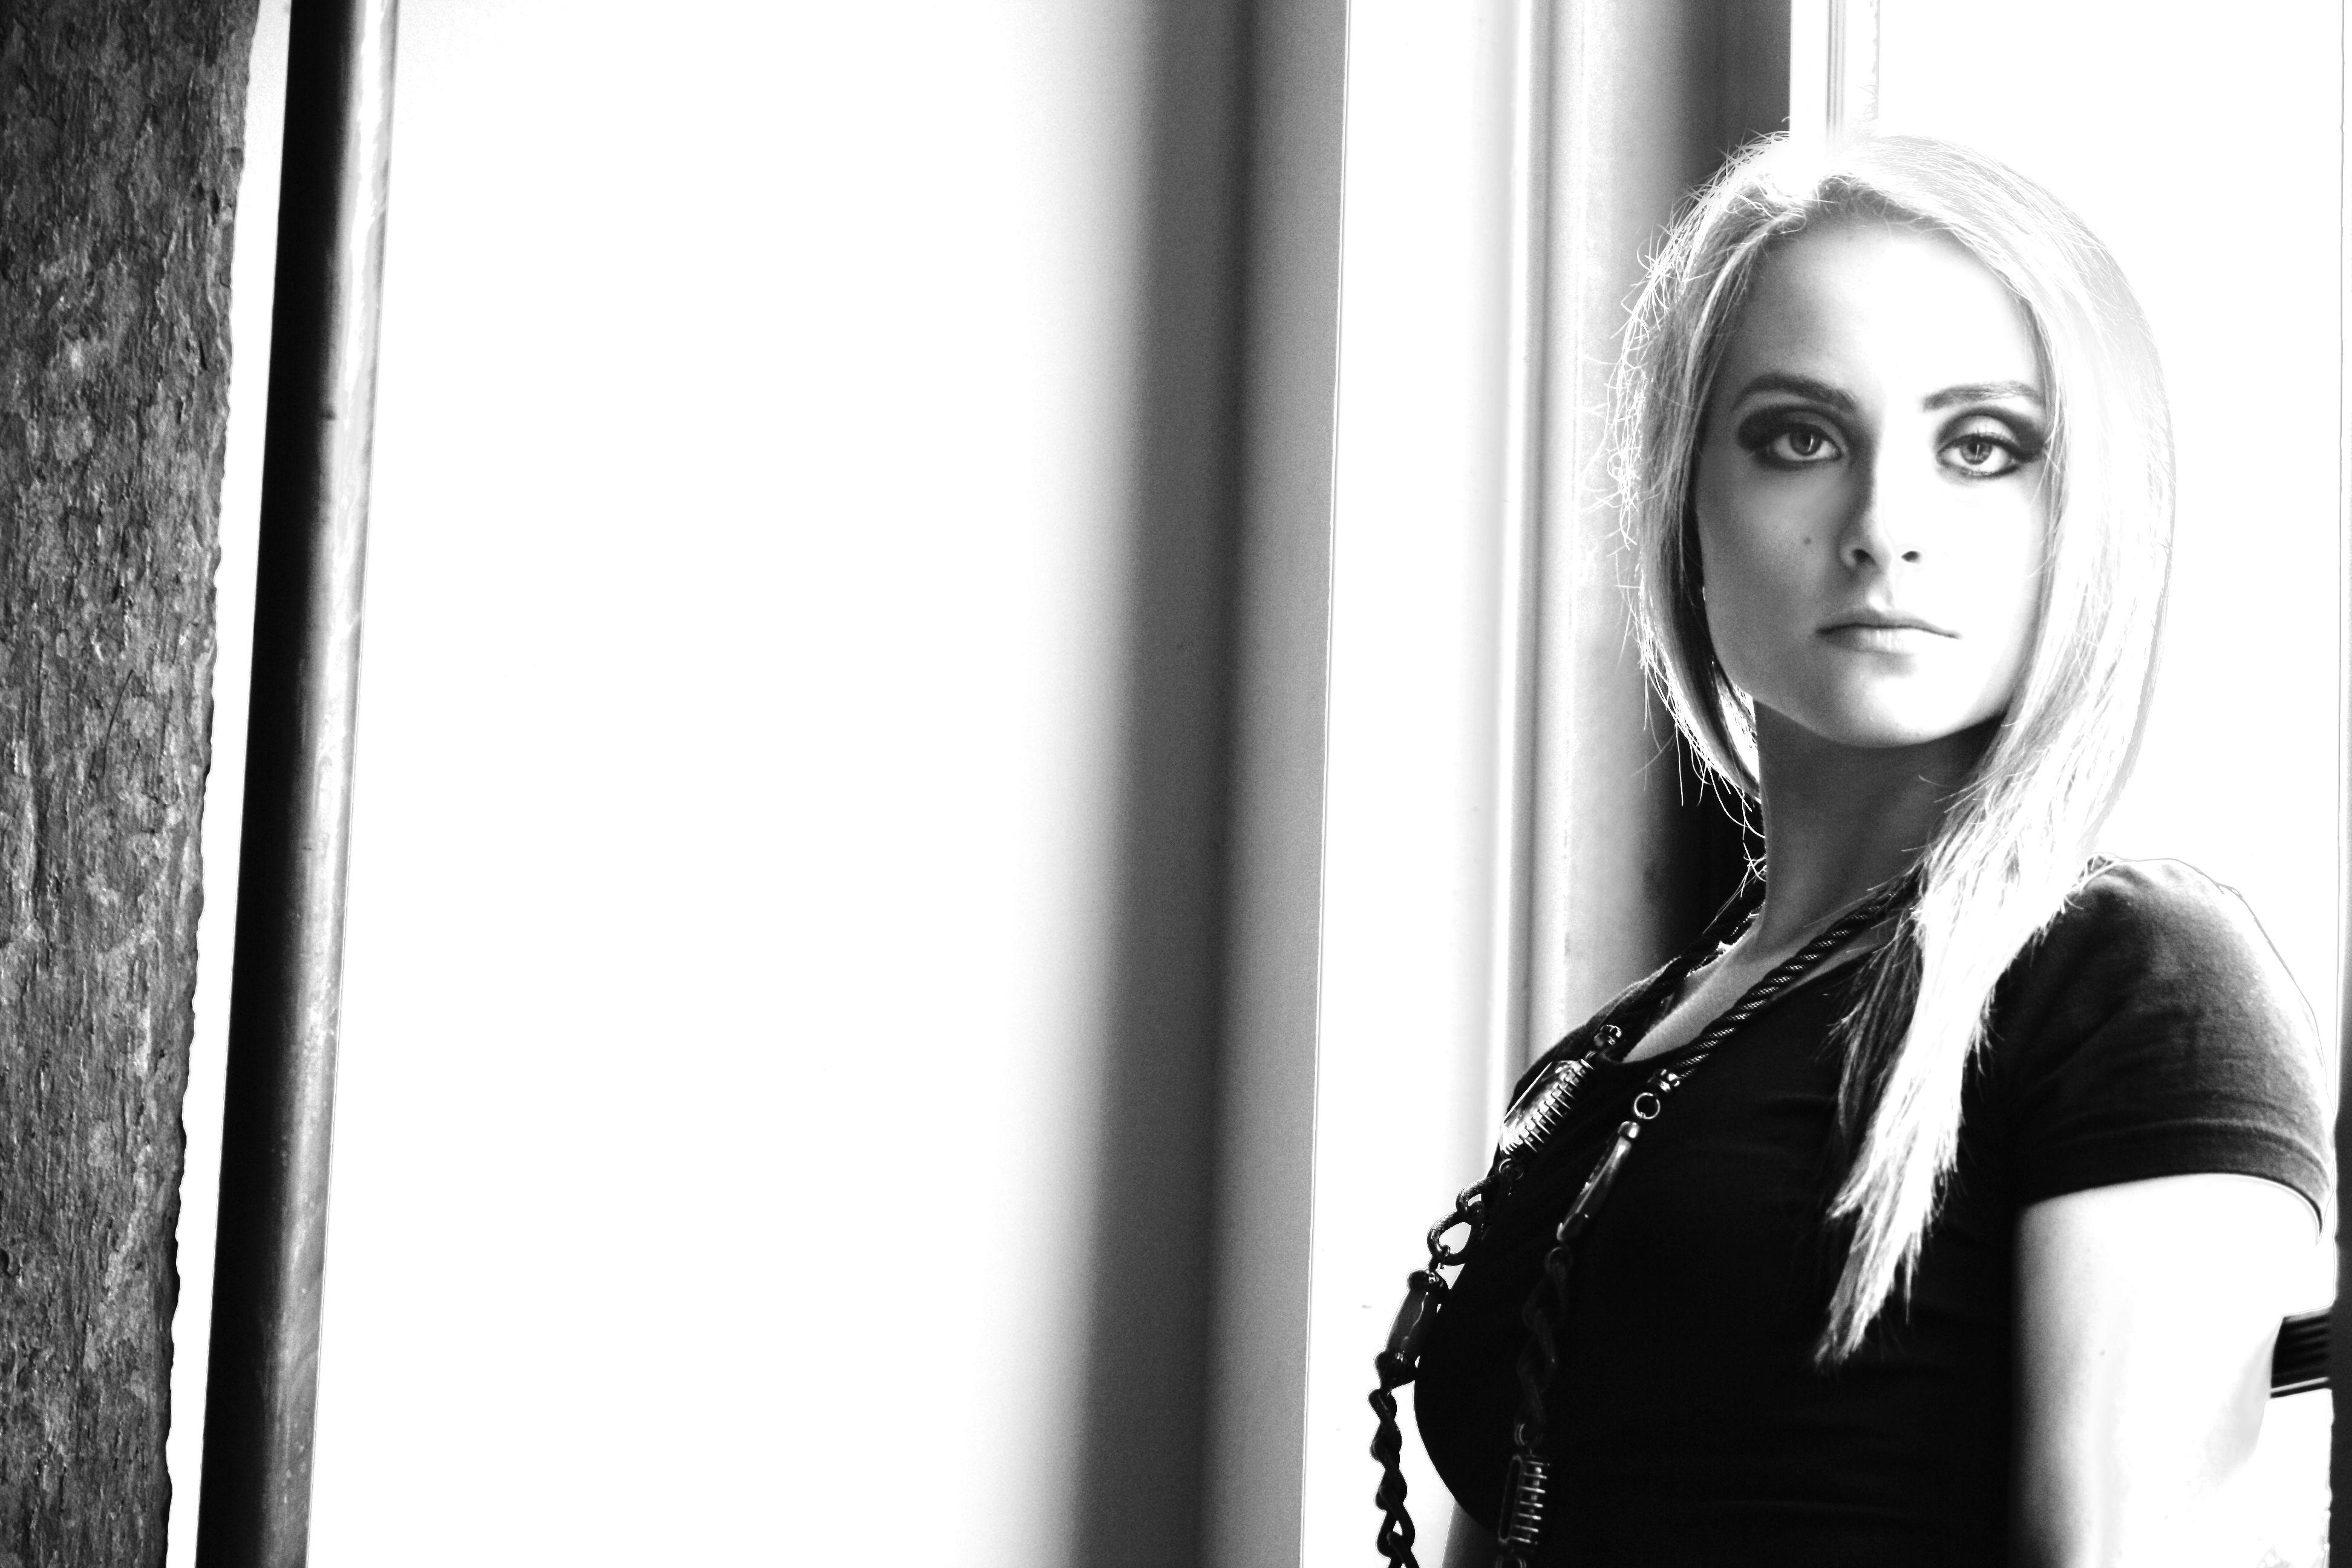 black and white photo by Sonya Kristina